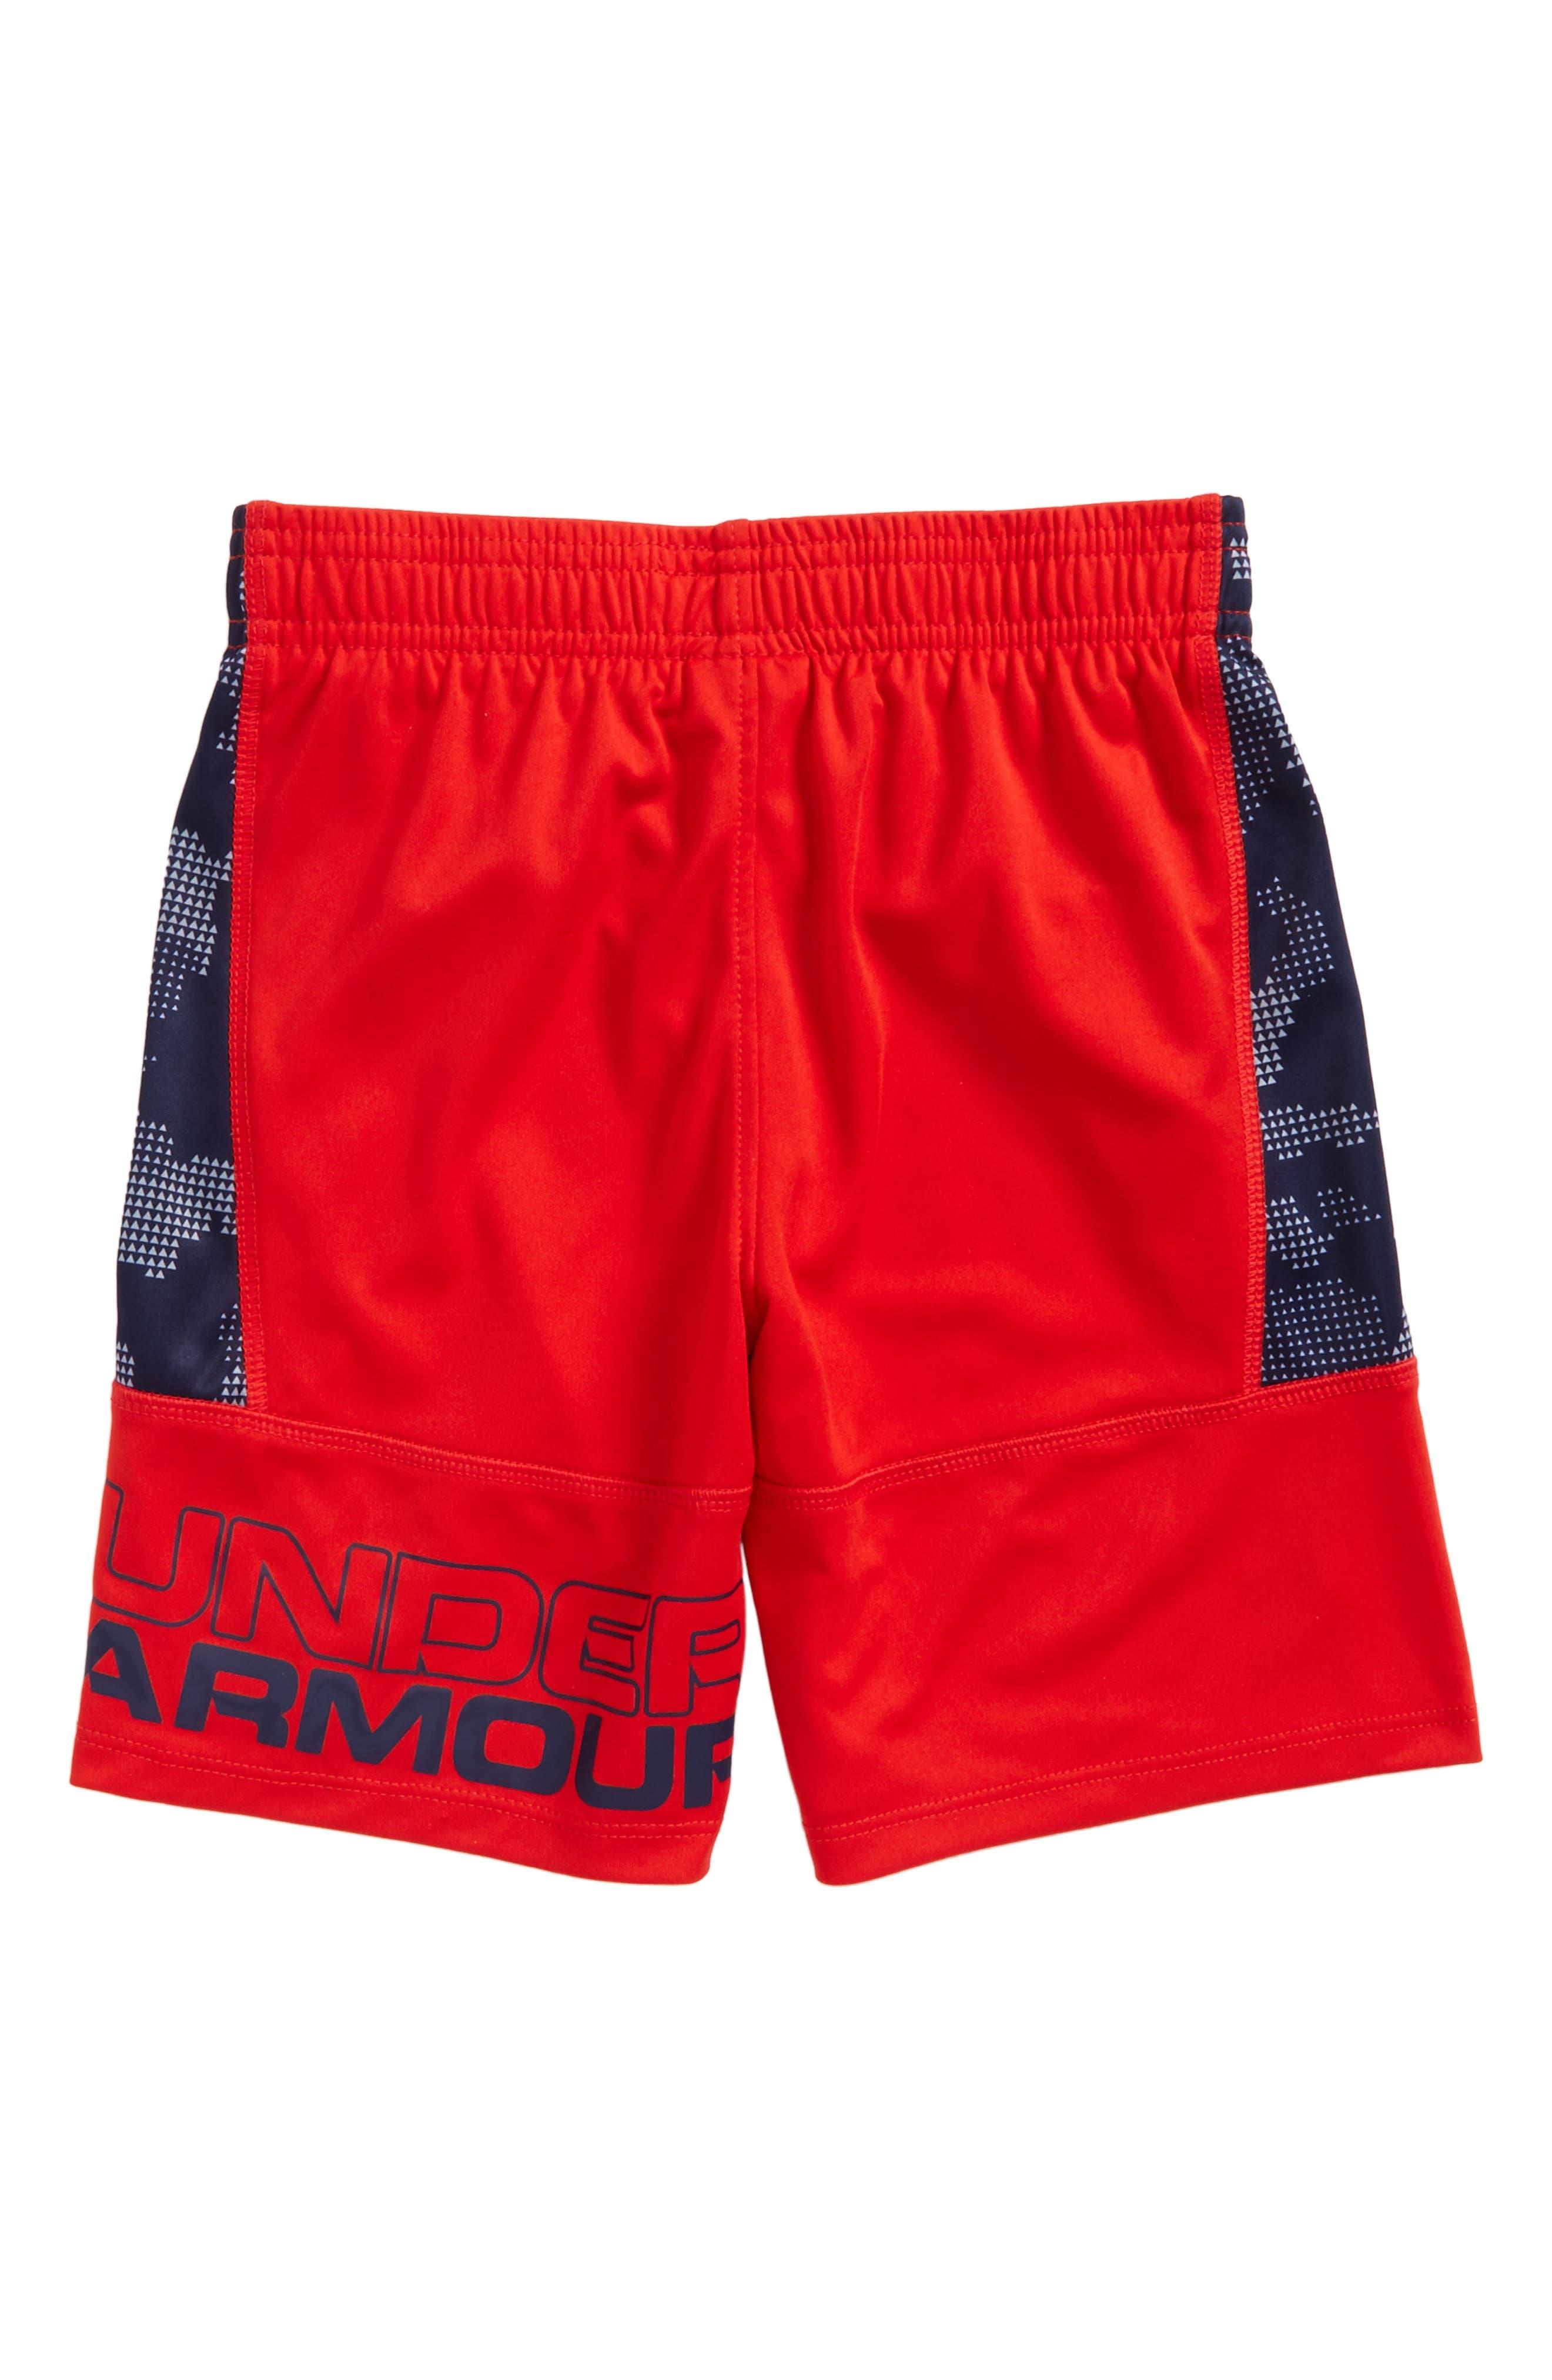 Utility Camo Stunt Athletic Shorts,                             Alternate thumbnail 2, color,                             600